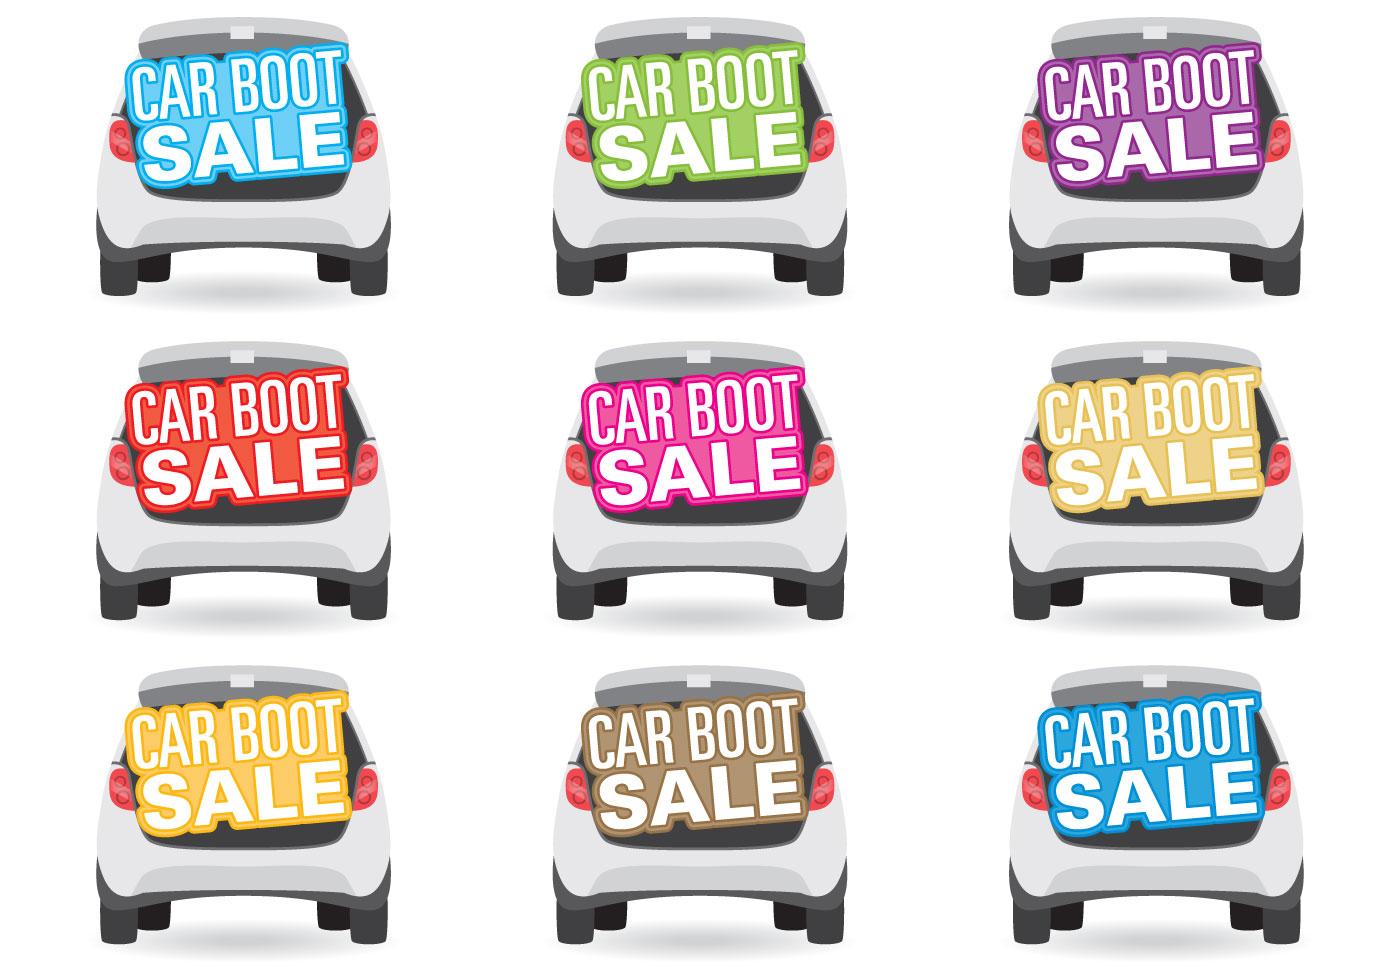 Platinum Motor Cars >> Car Boot Sale Titles - Download Free Vector Art, Stock Graphics & Images